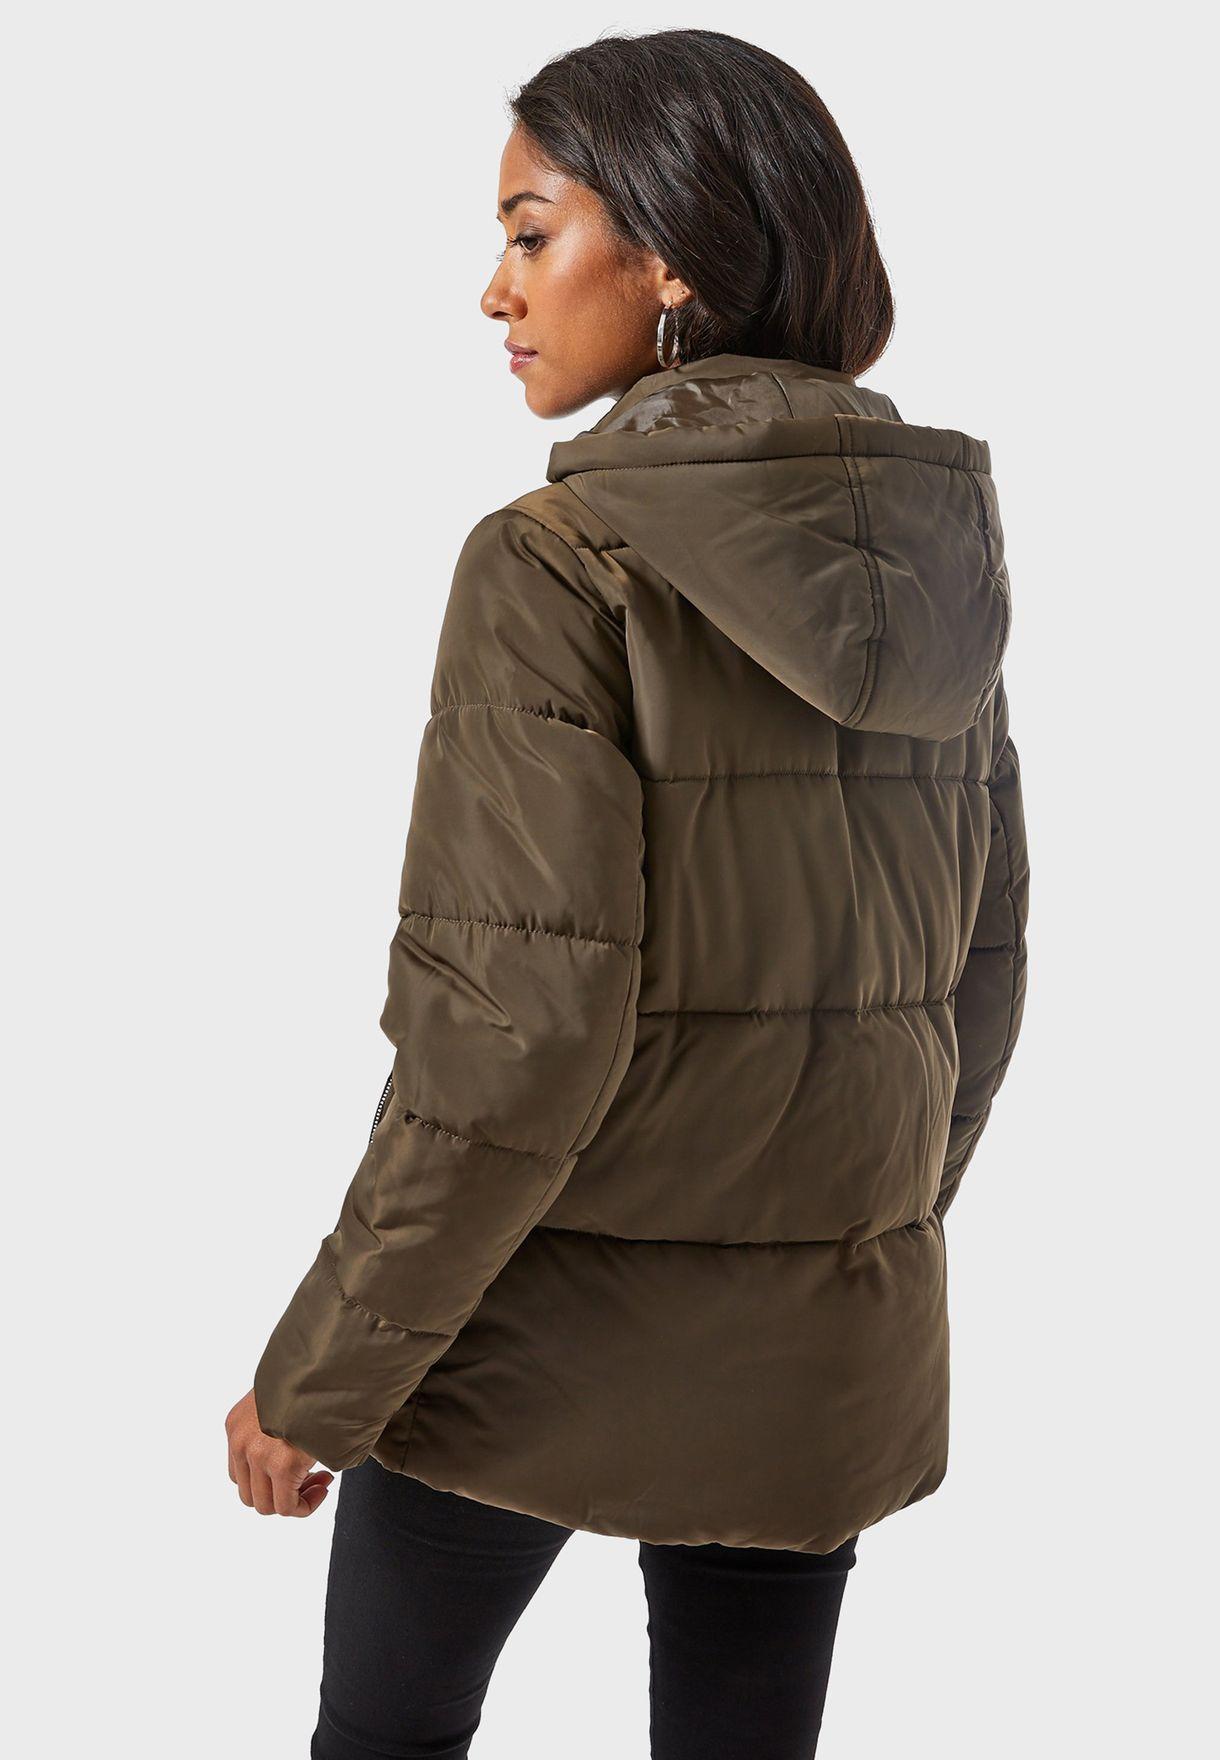 Ladies Dorothy Perkins padded Hooded Parka Coat Jacket Khaki size 14 RRP £69